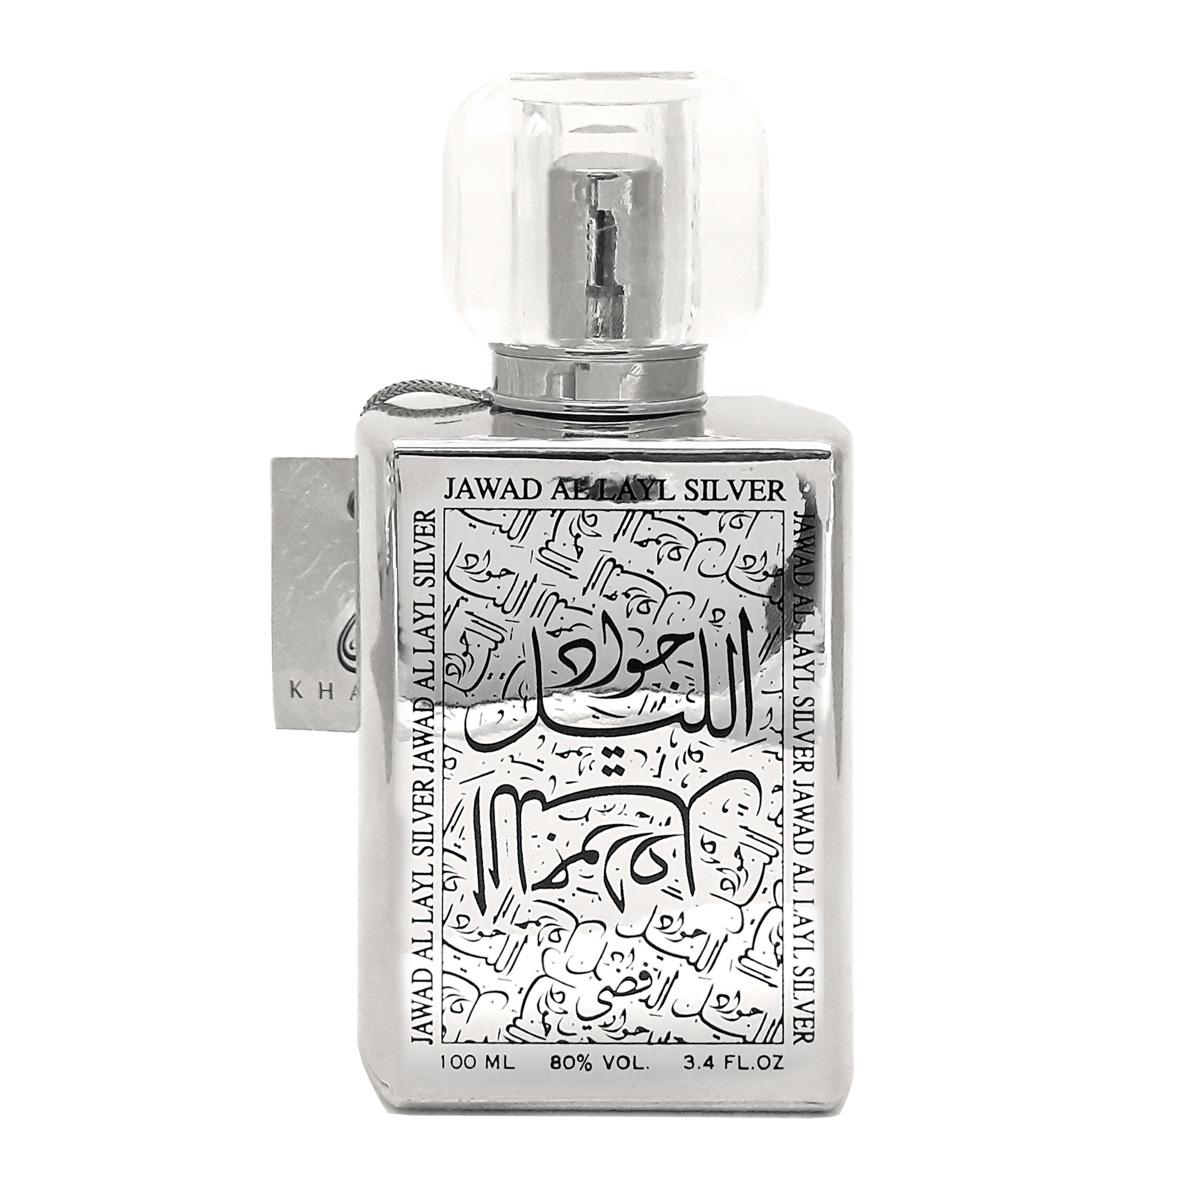 Jawad al Layl Silver / Джавад Аль Лайл Серебро 100 мл спрей от Халис Khalis Perfumes